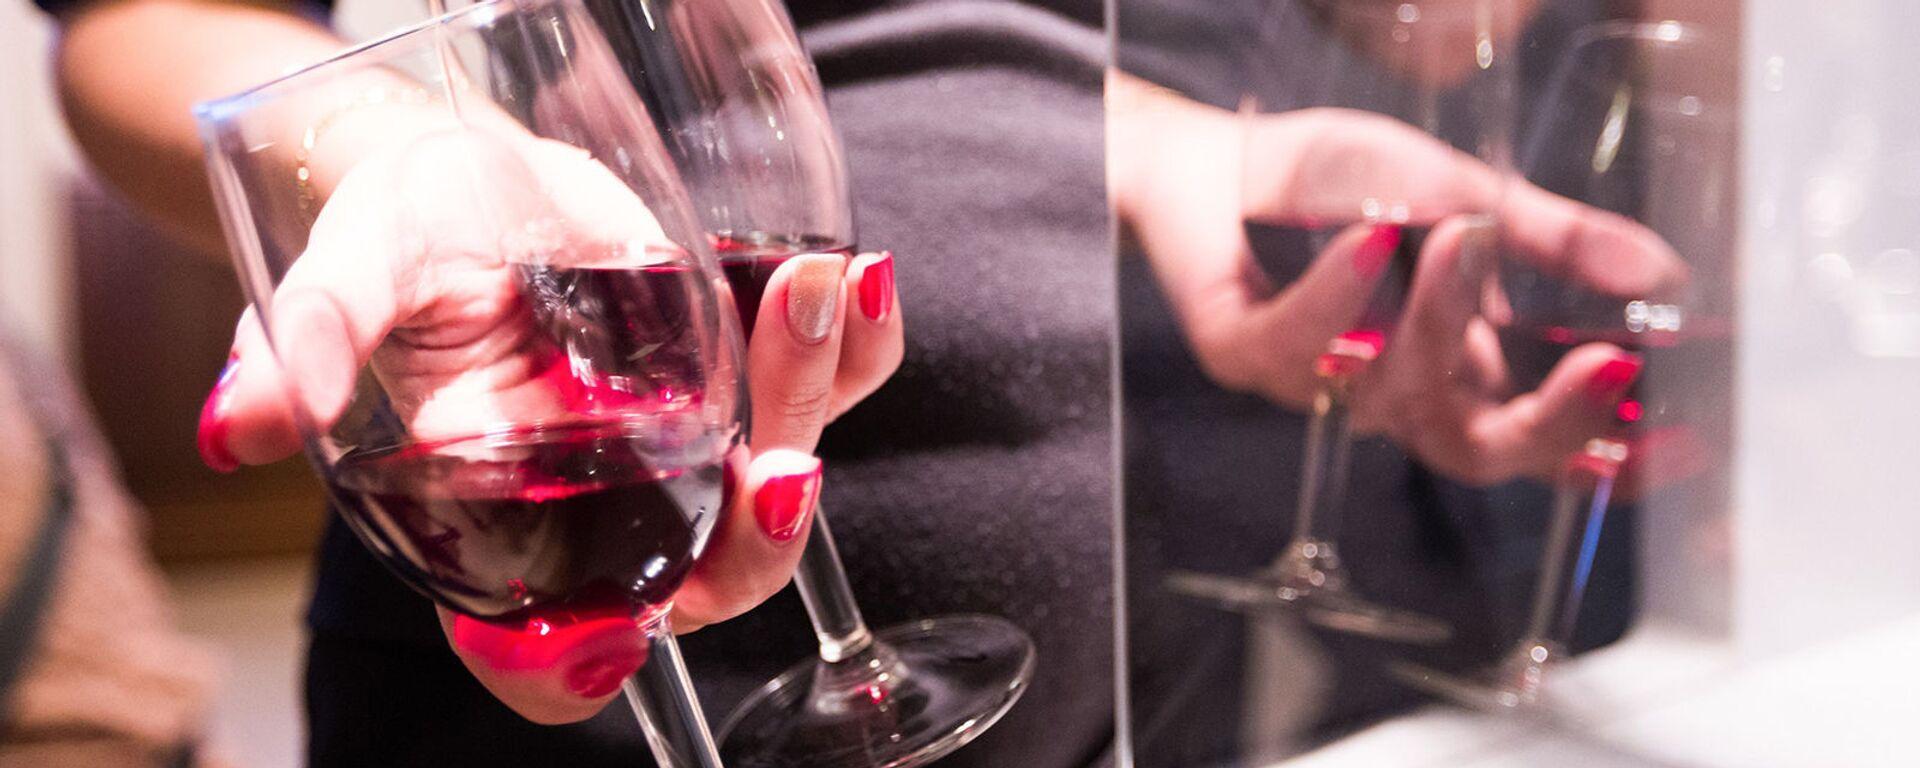 Девушка с бокалами красного вина - Sputnik Արմենիա, 1920, 27.04.2021